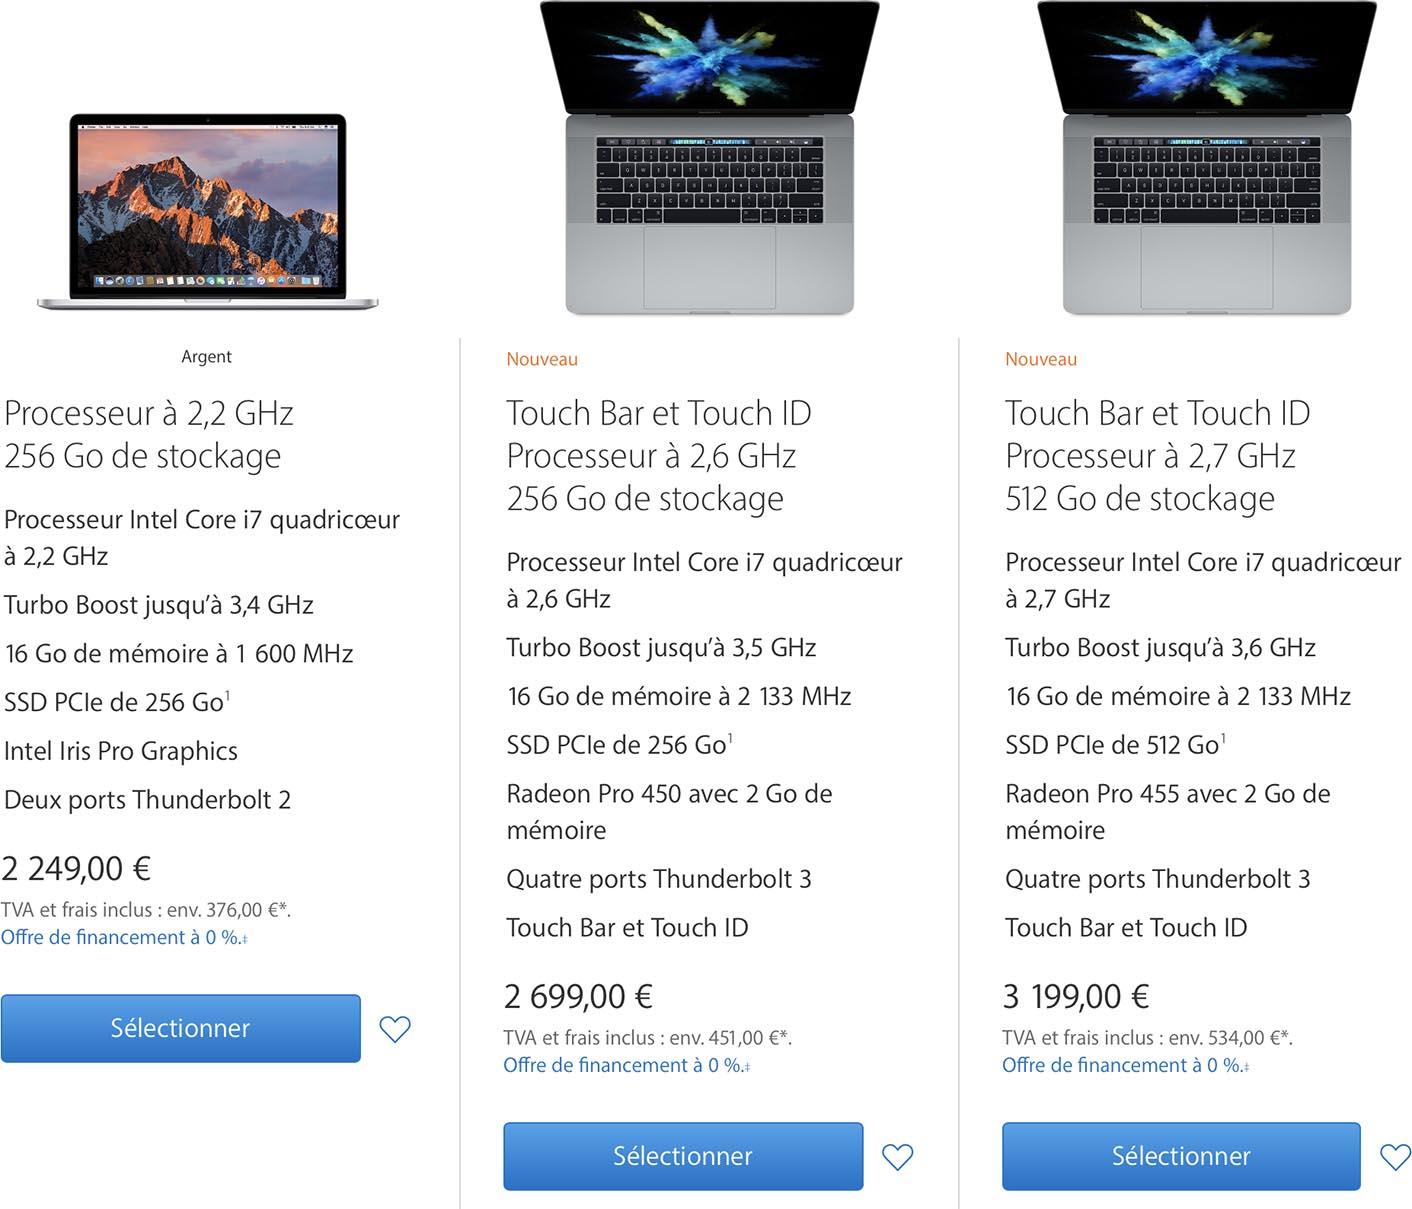 Comparer MacBook Pro 2015 et 2016